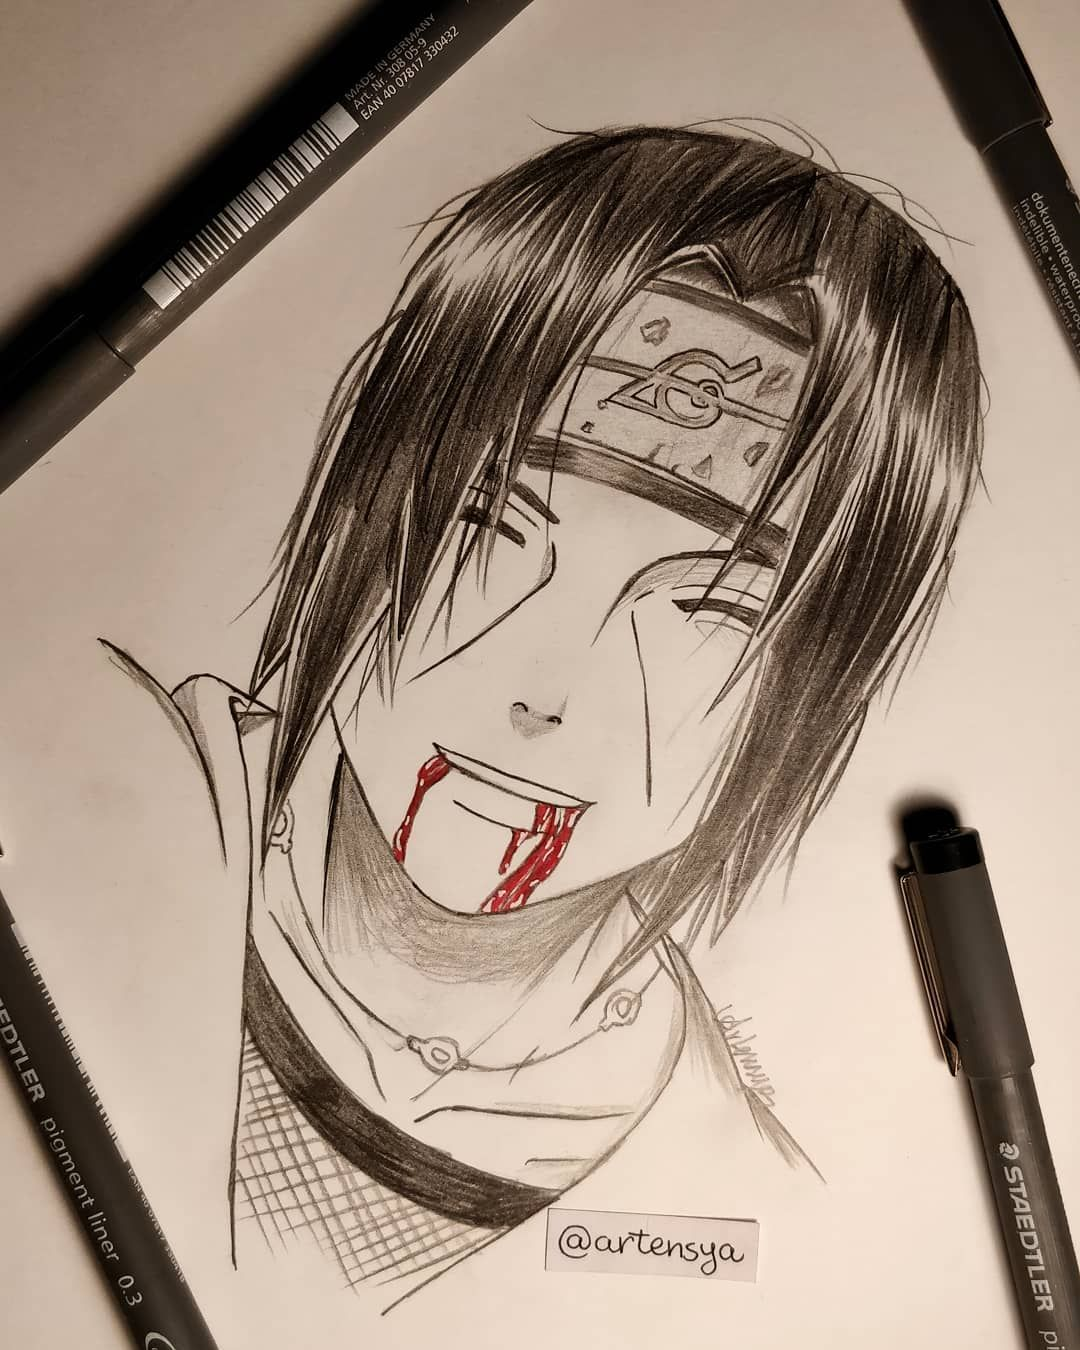 Itachi Uchiha Sorry Sasuke There Won T Be A Next Time Itachi Or Sasuke Follow Me Artensya Naruto Desenho Desenhos Desenho De Anime